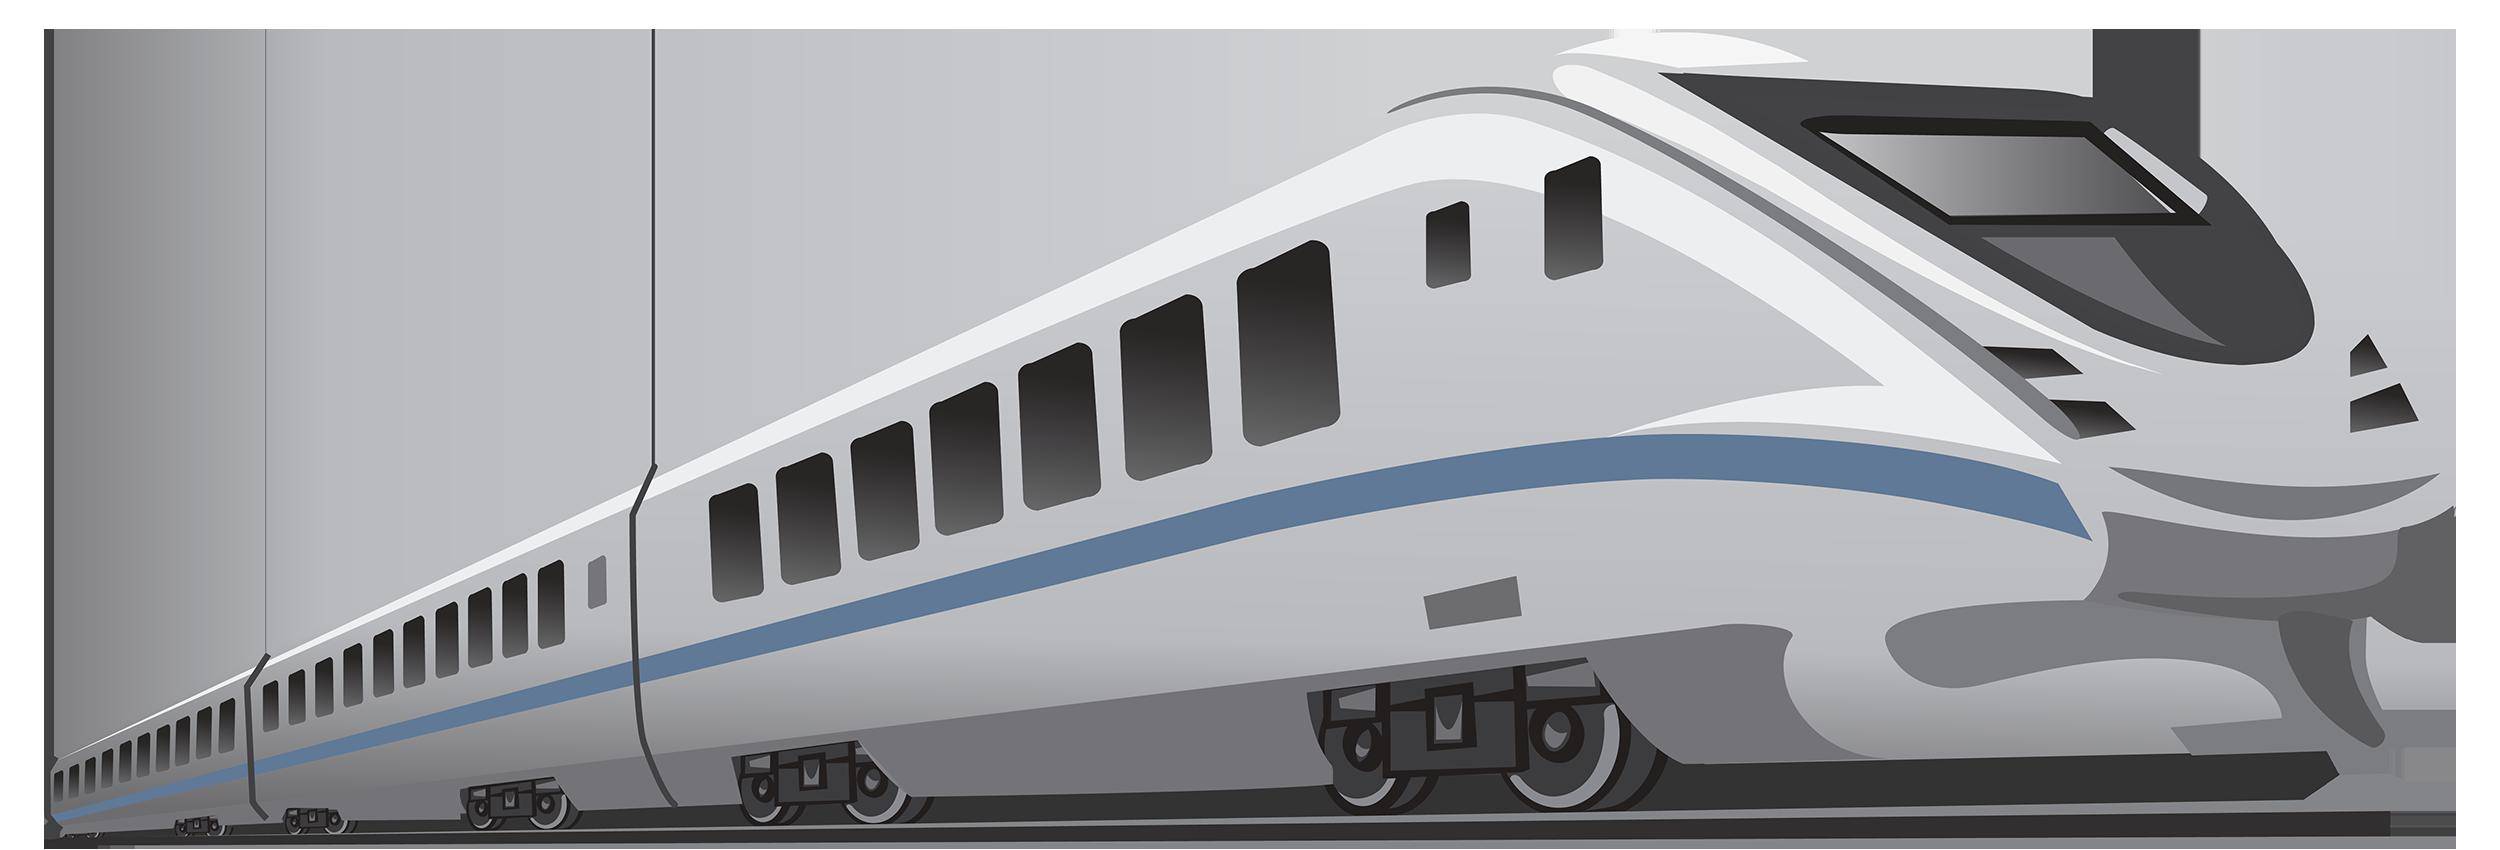 Modern best web. Clipart png train